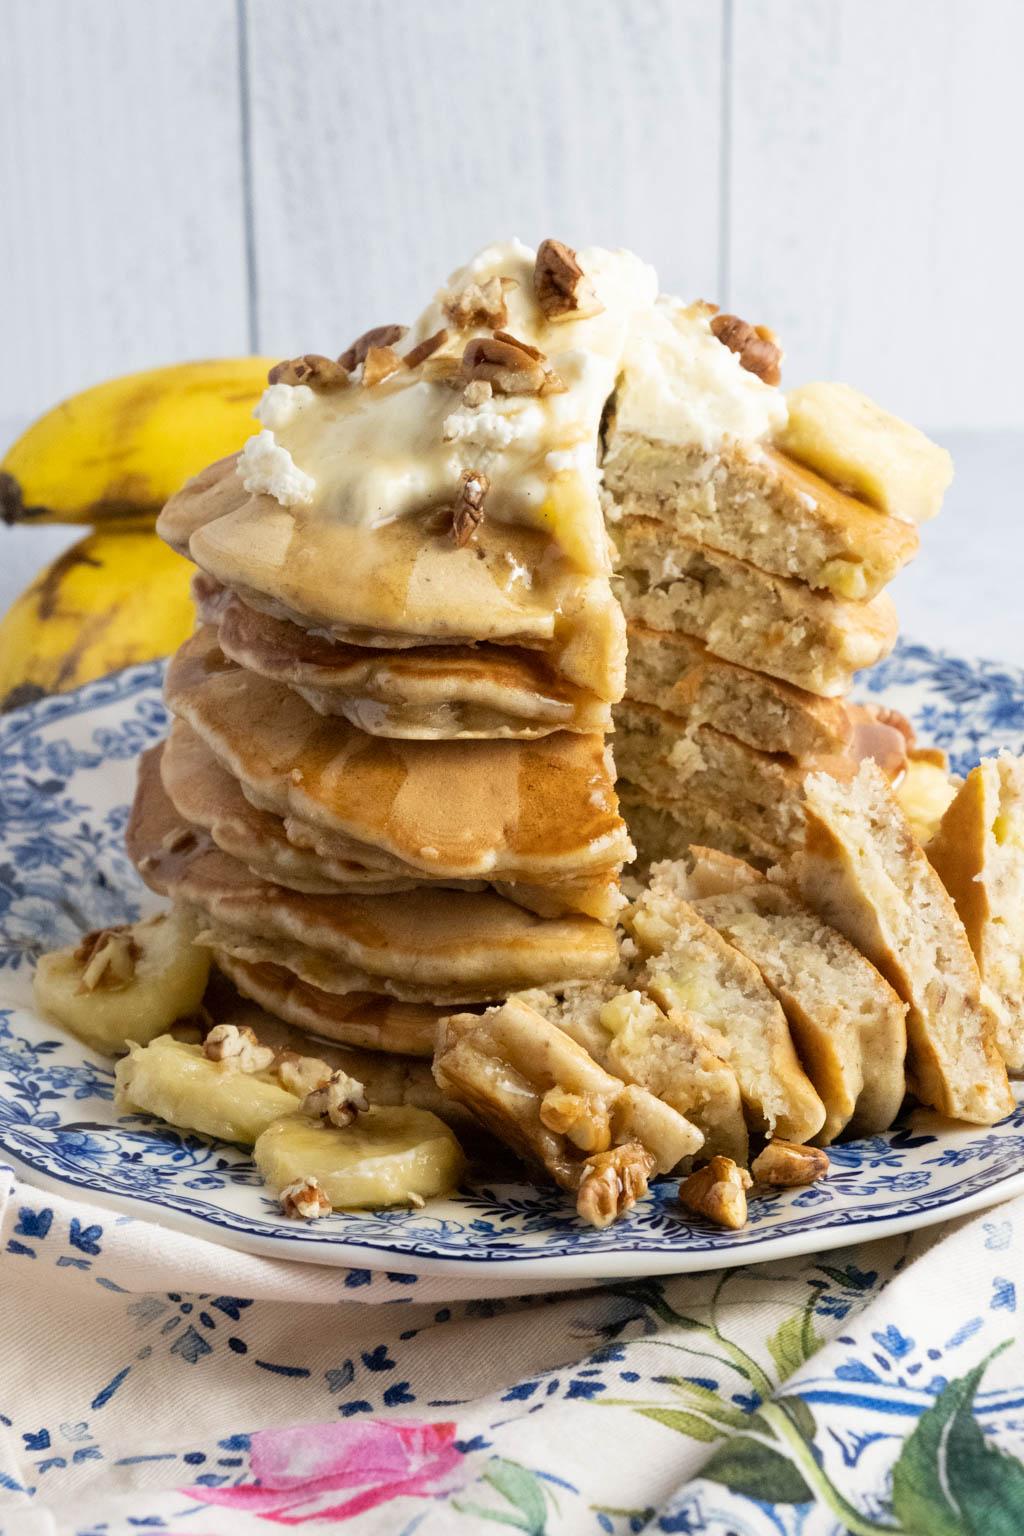 Hummingbird Pancakes with Whipped Cream Cheese